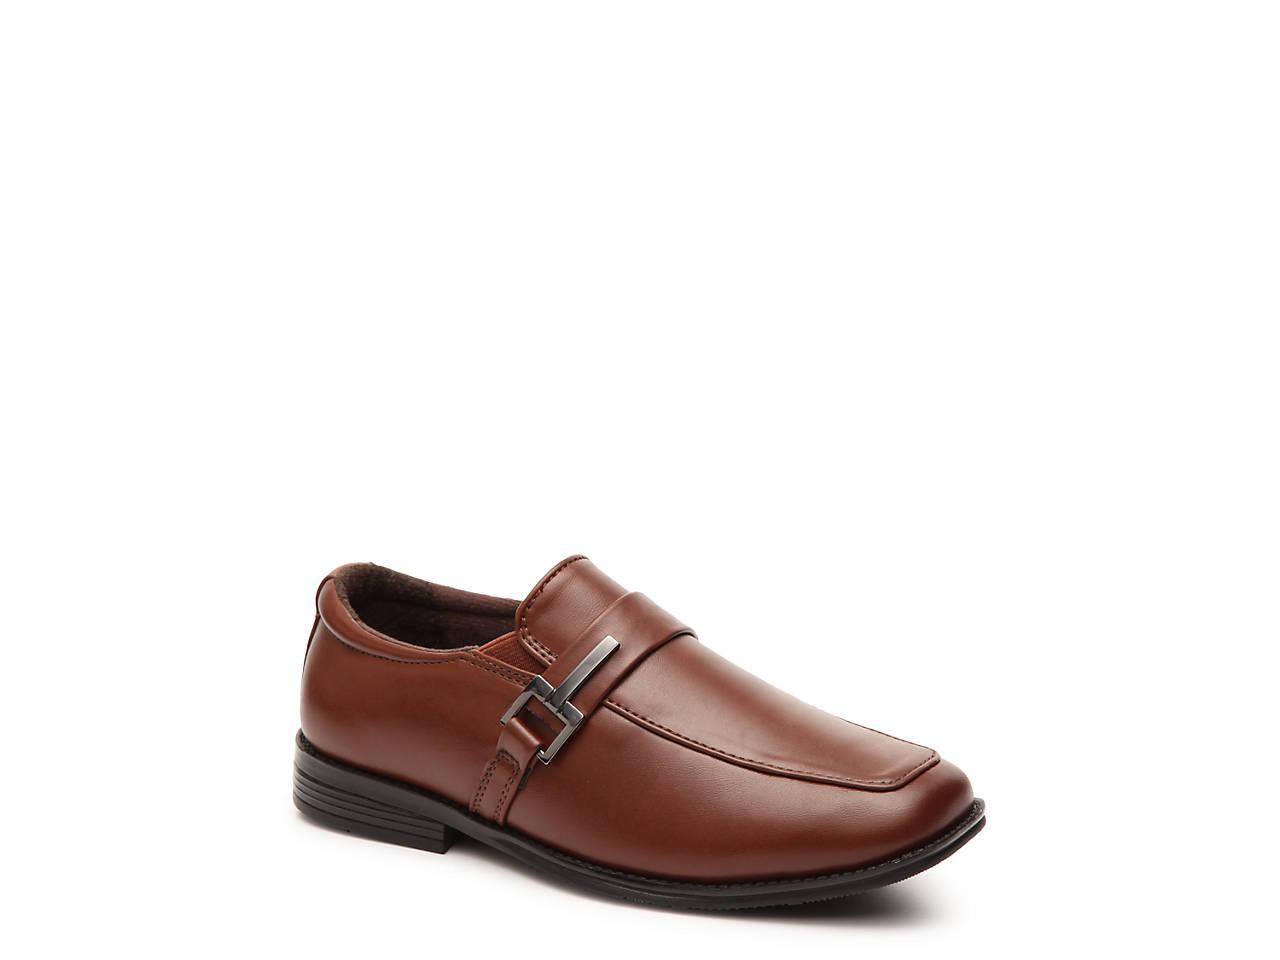 85f158a90bc Max + Jake Sebastian Youth Slip-On Kids Shoes